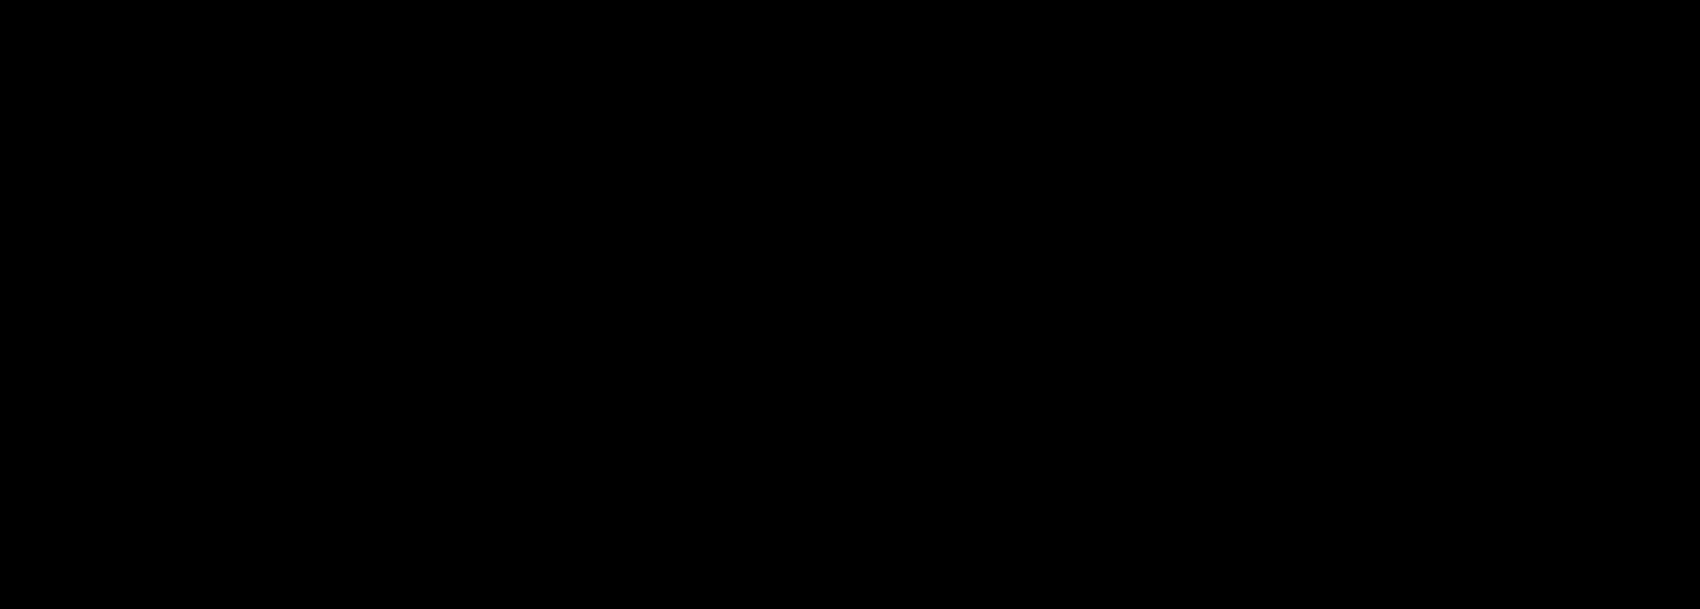 The official signature of Mustafa Kemal Atatürk, designed by Hagop Çerçiyan in 1934